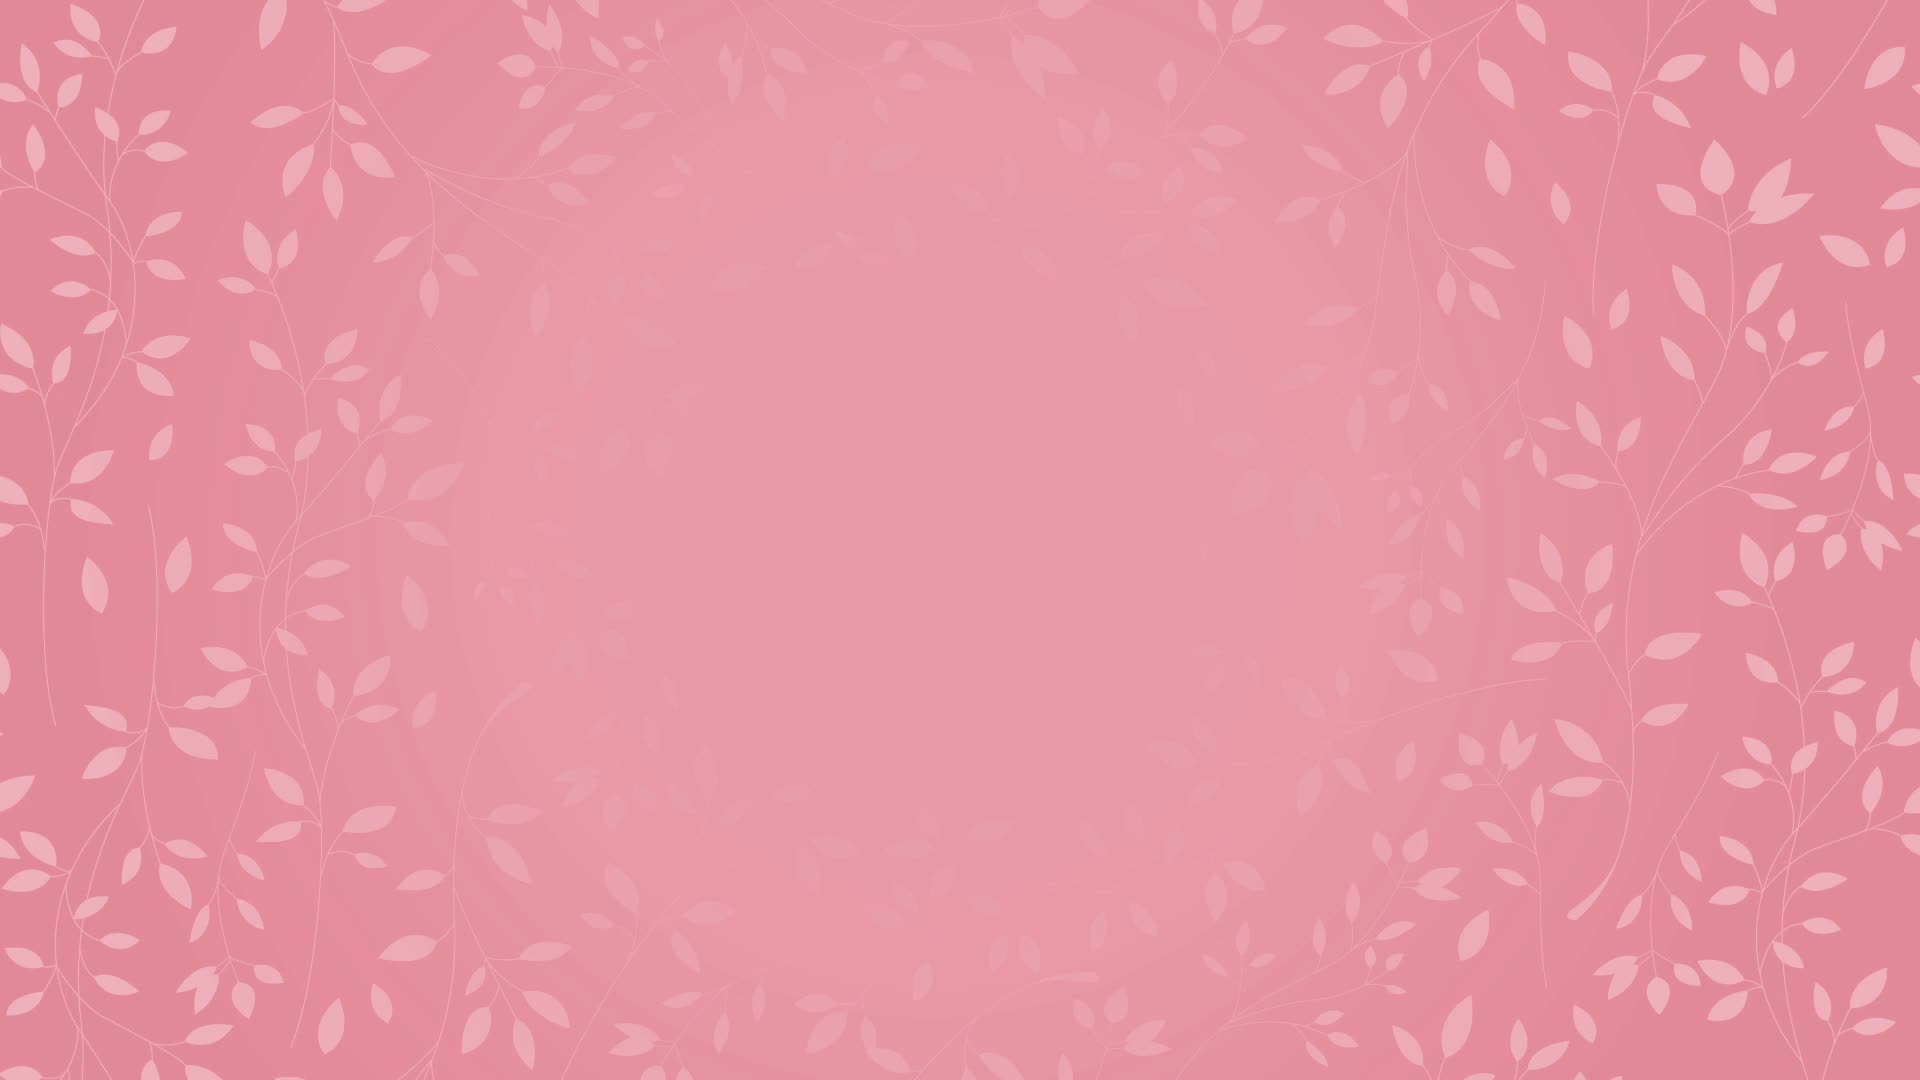 Kamayi Low Smell Harmless Resin Gray Color Cheap Led/uv Soak Off Organic  Gel Nail Polish - Buy Nail Gel,Organic Gel Nail Polish,Acrylic Soak Off  Dish